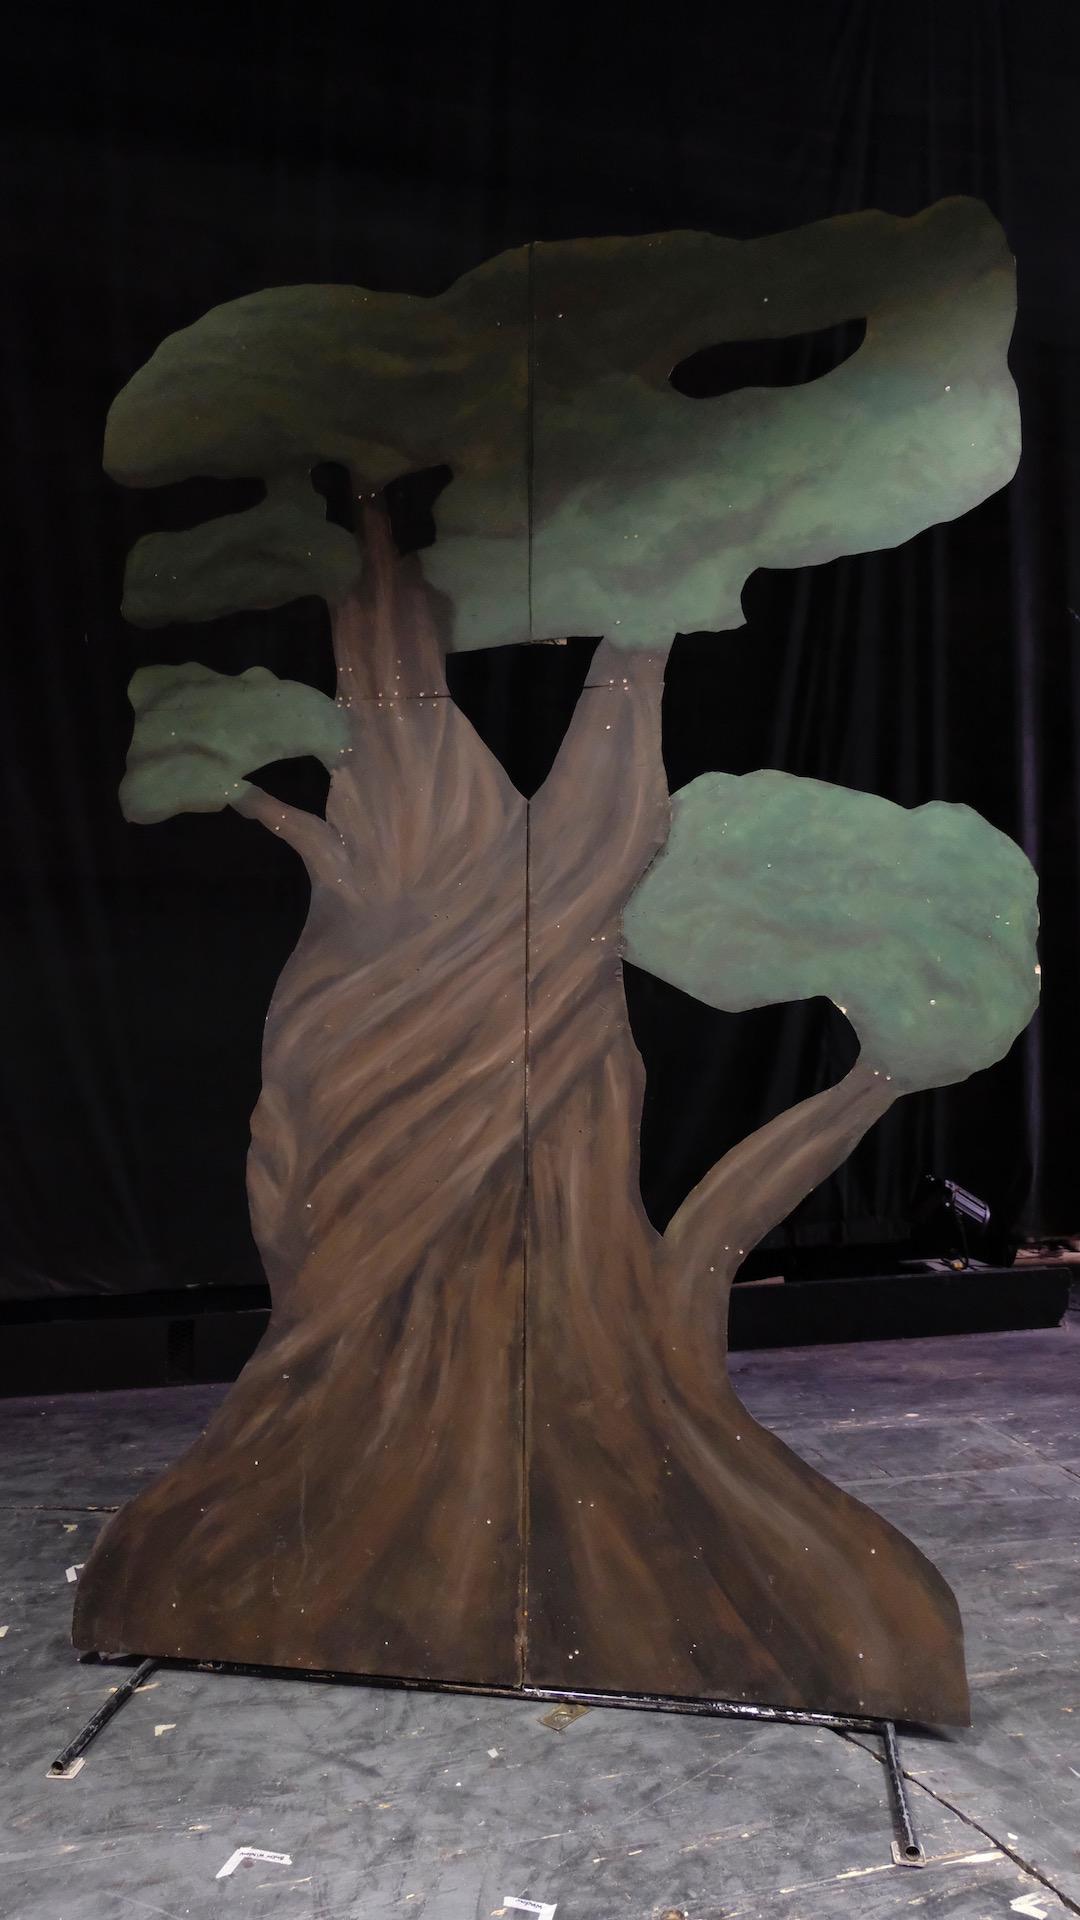 Boy Who Cried Wolf Tree Standee